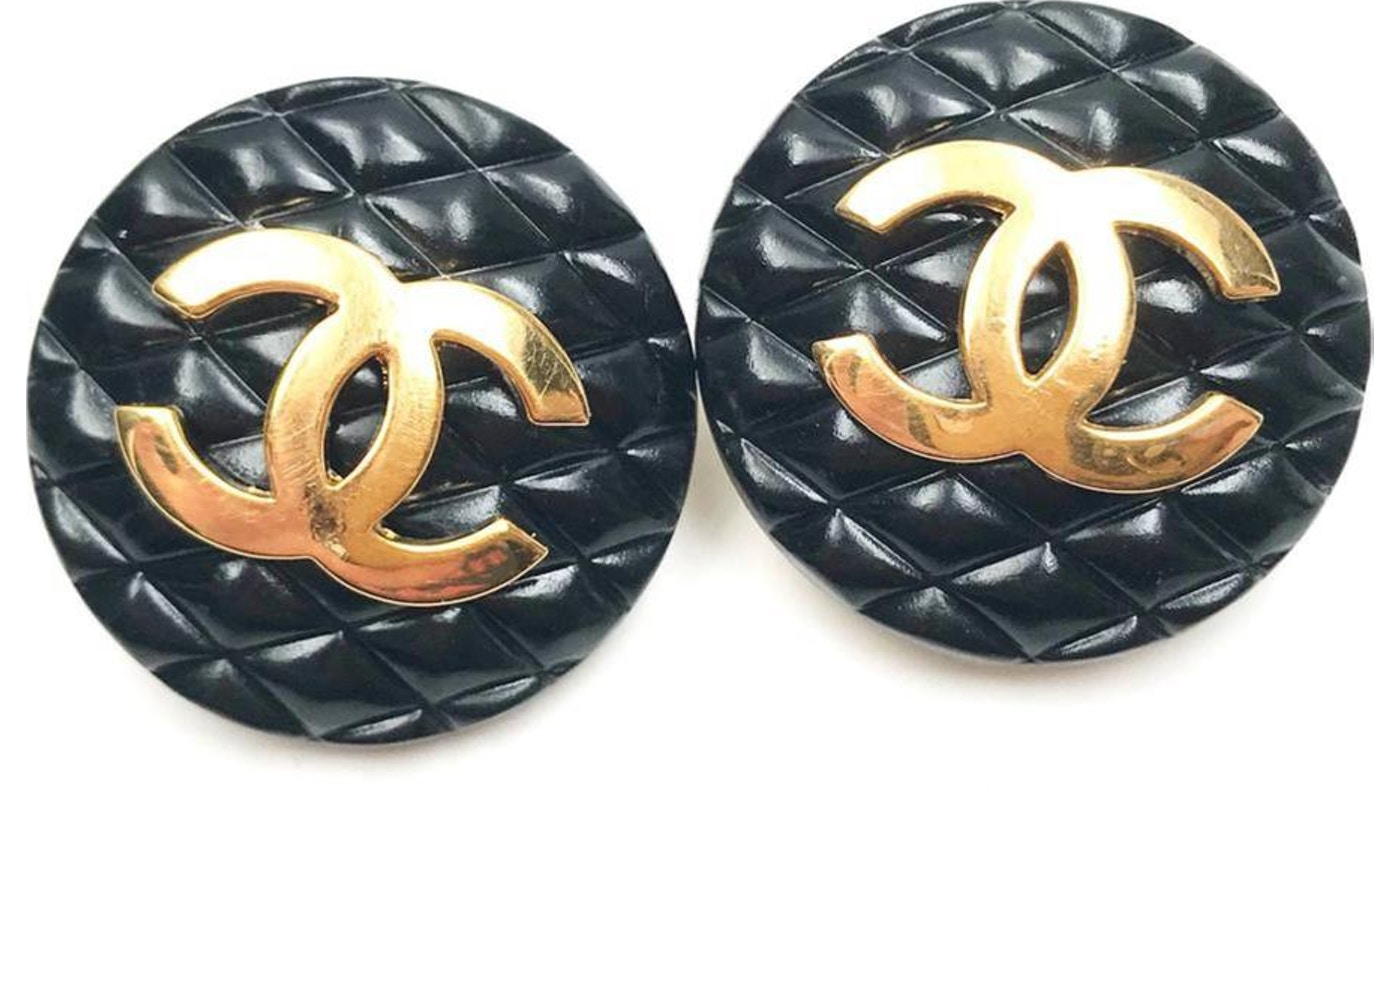 4998563fa25 Buy   Sell Chanel Handbags - Most Popular